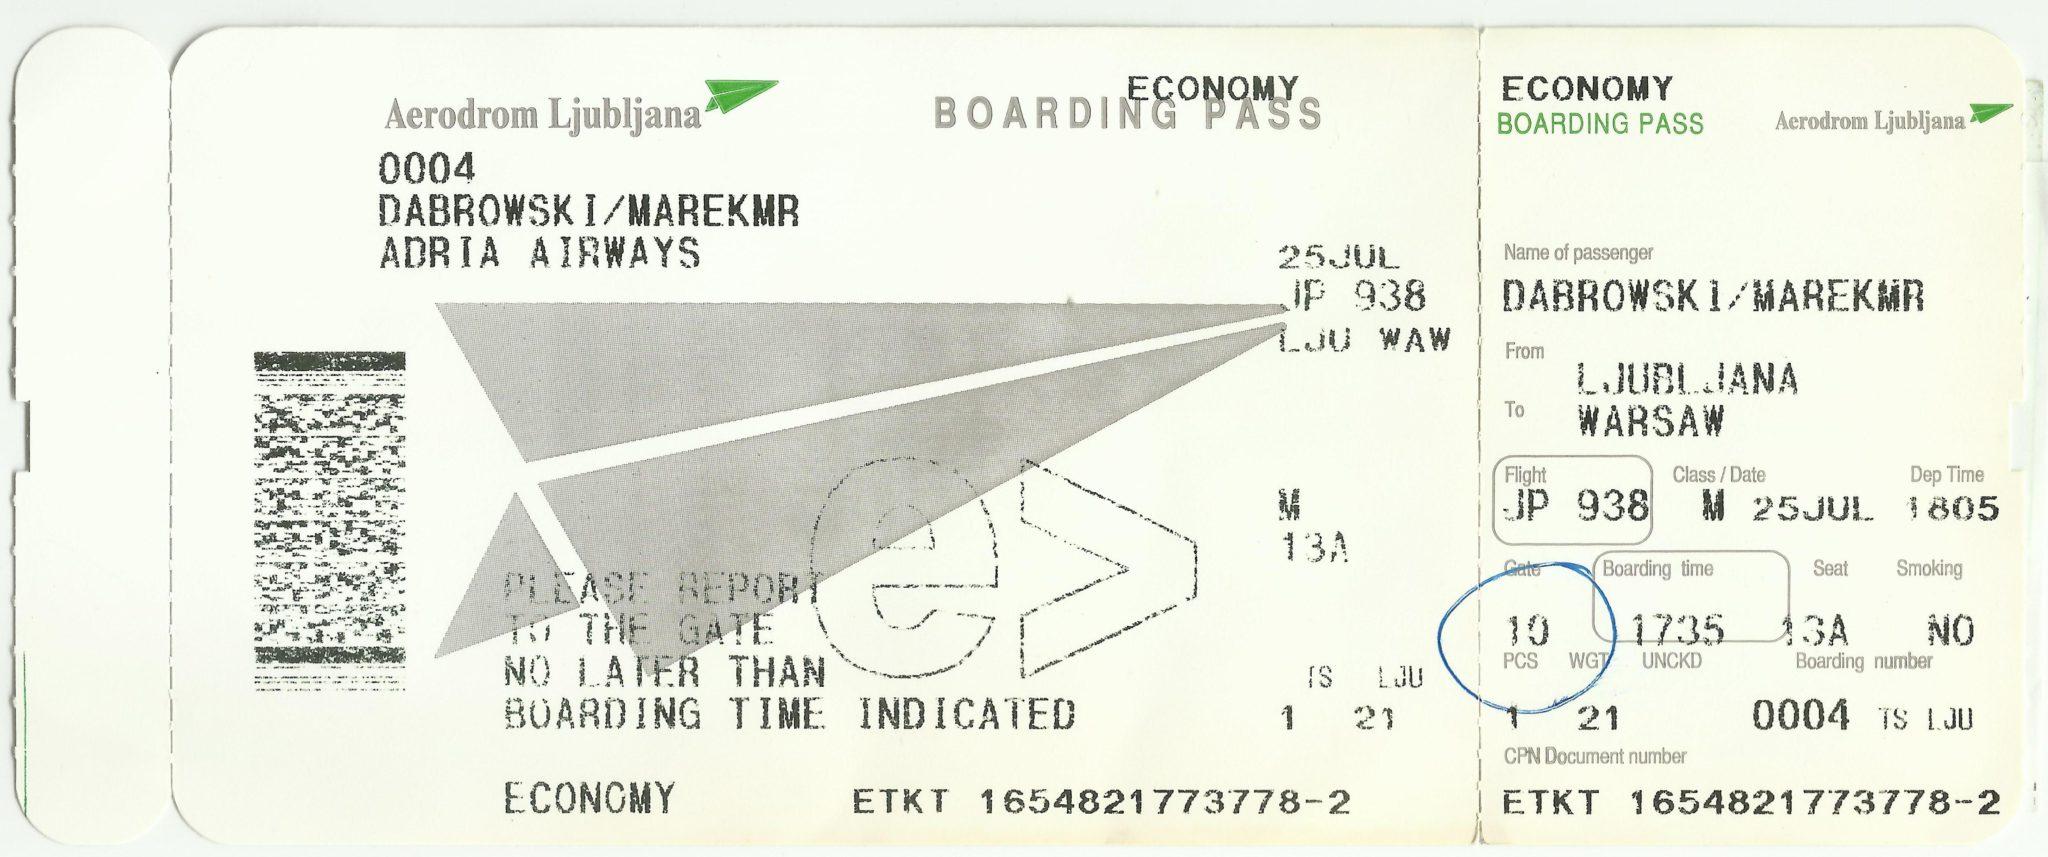 tani bilet lotniczy